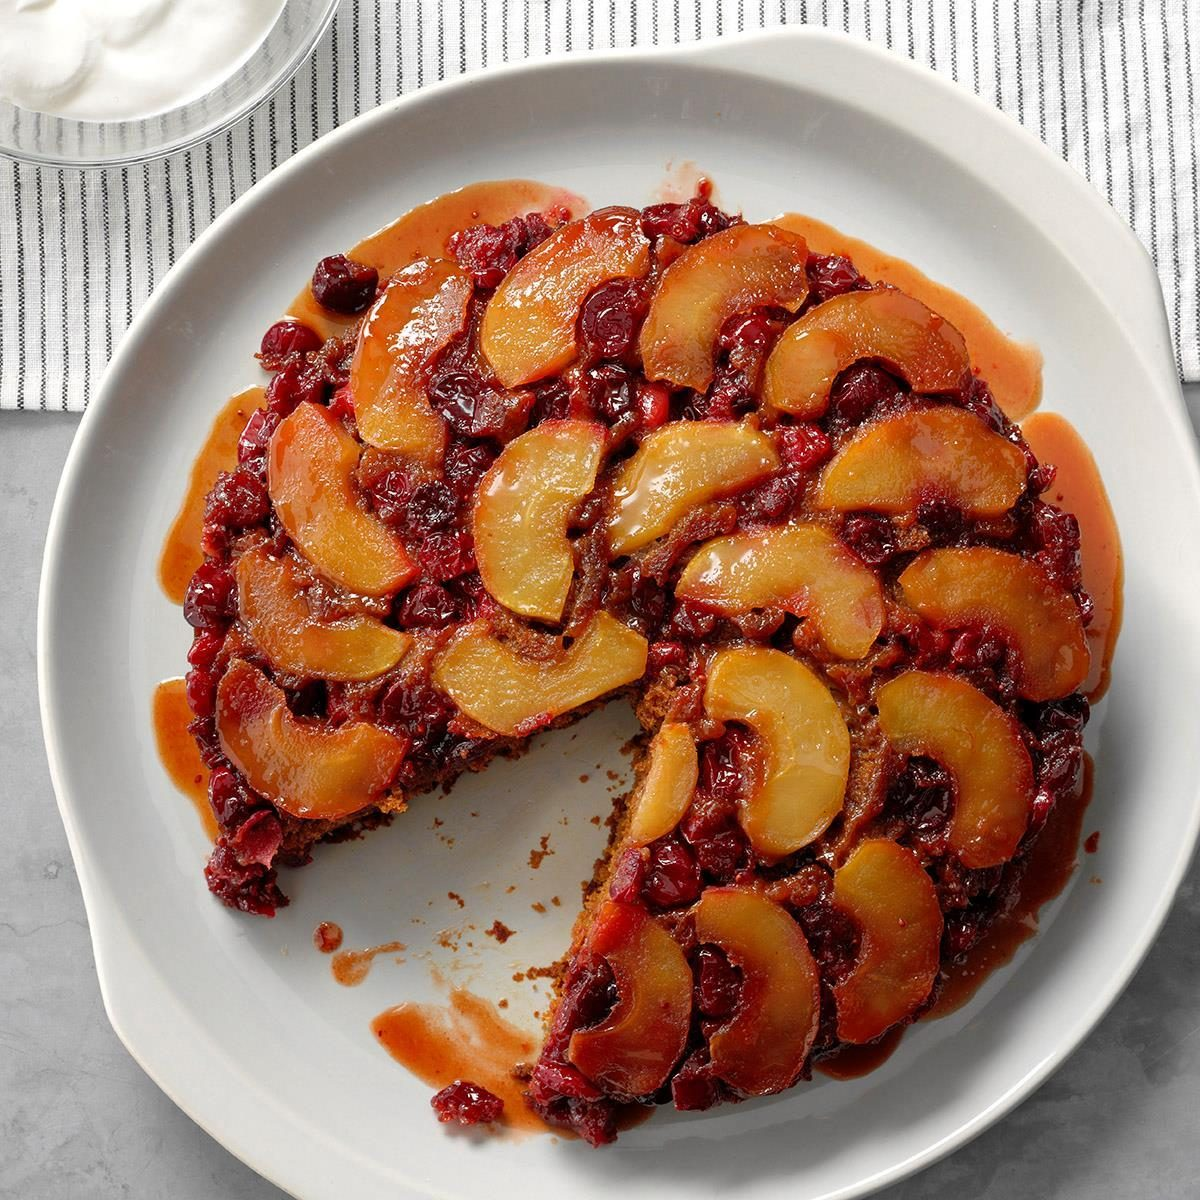 Minnesota: Cran-Apple Praline Gingerbread